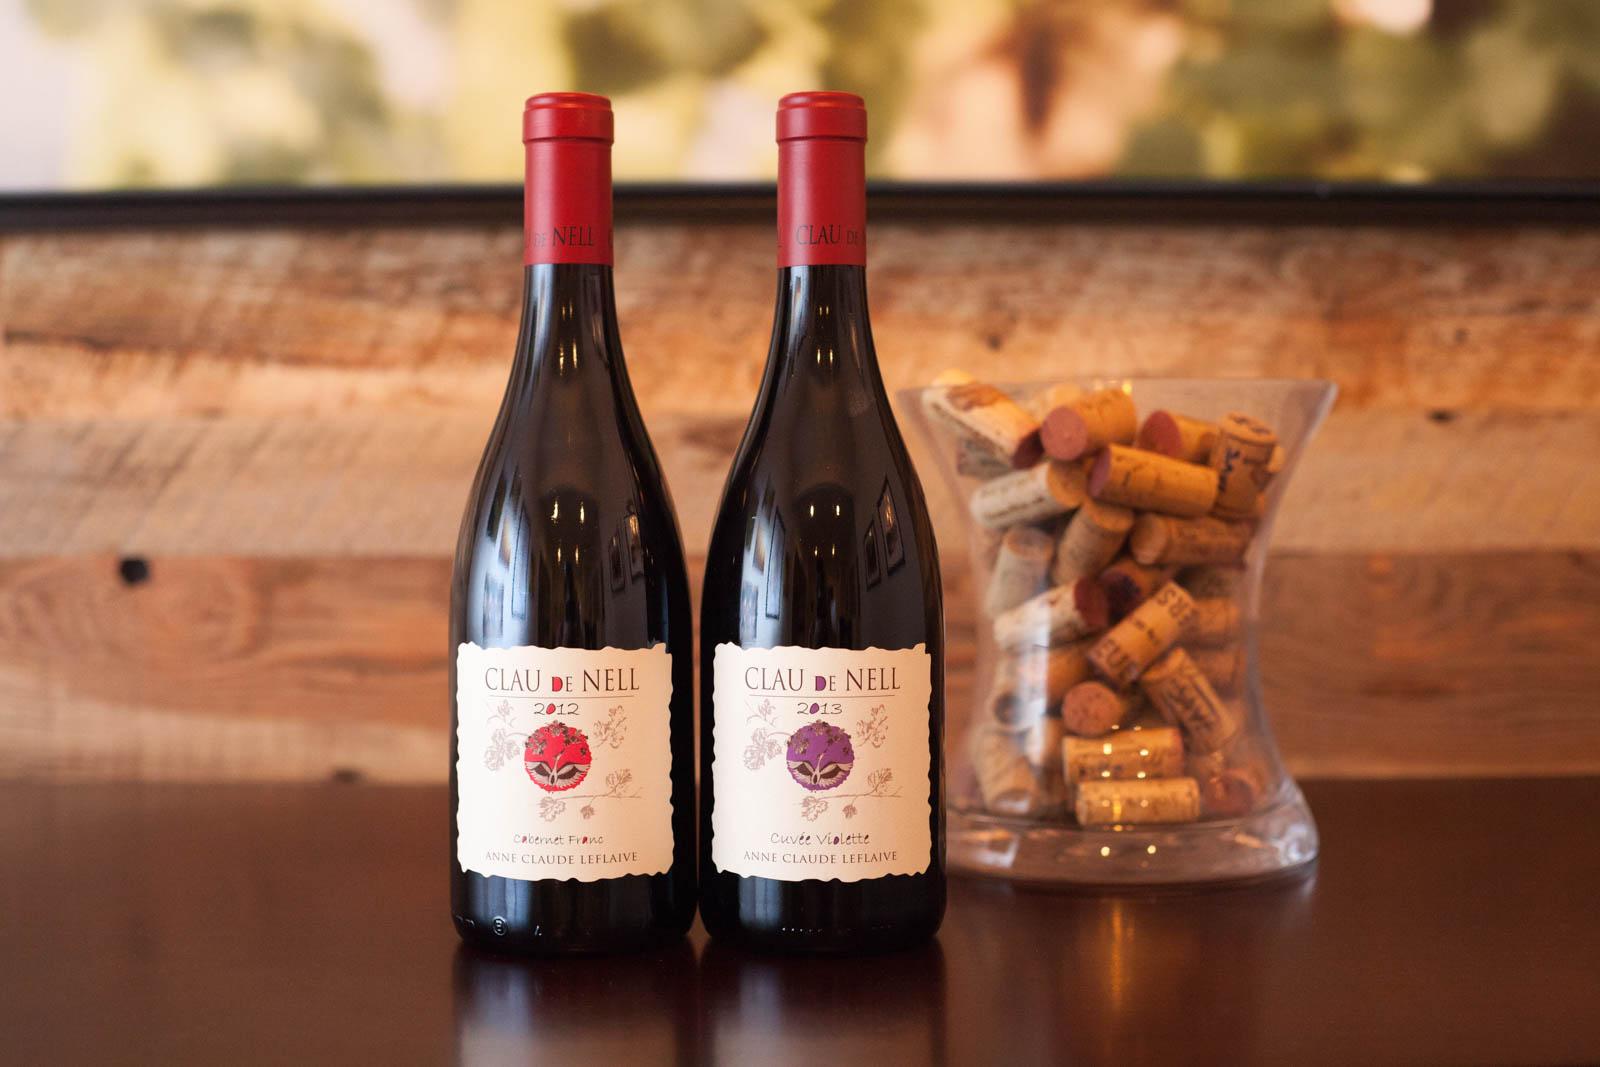 Clau de Nell wines